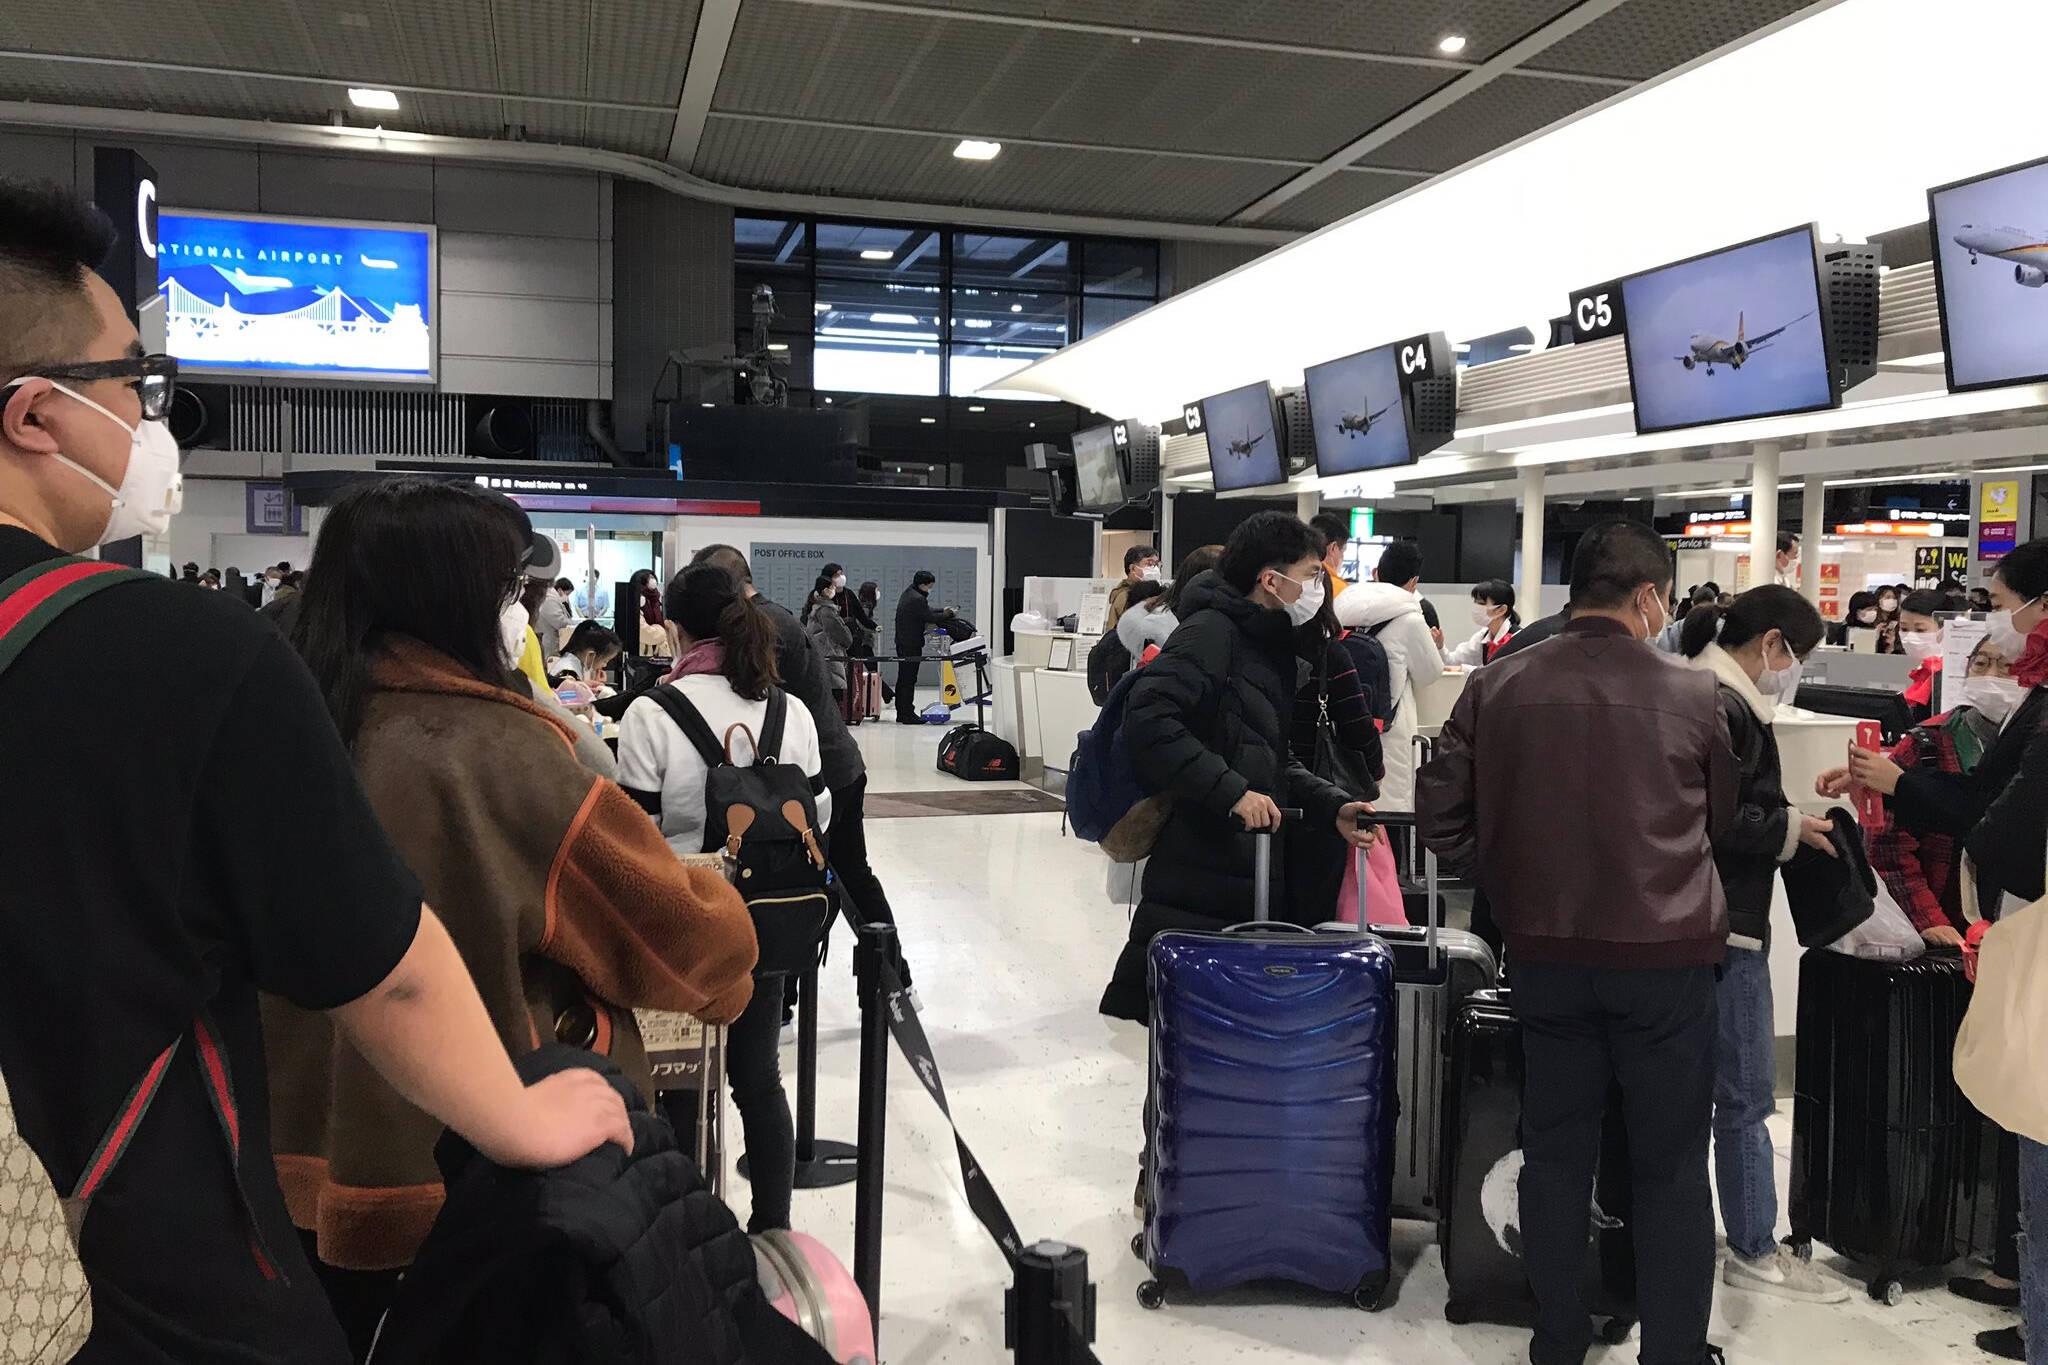 canadians evacuation wuhan